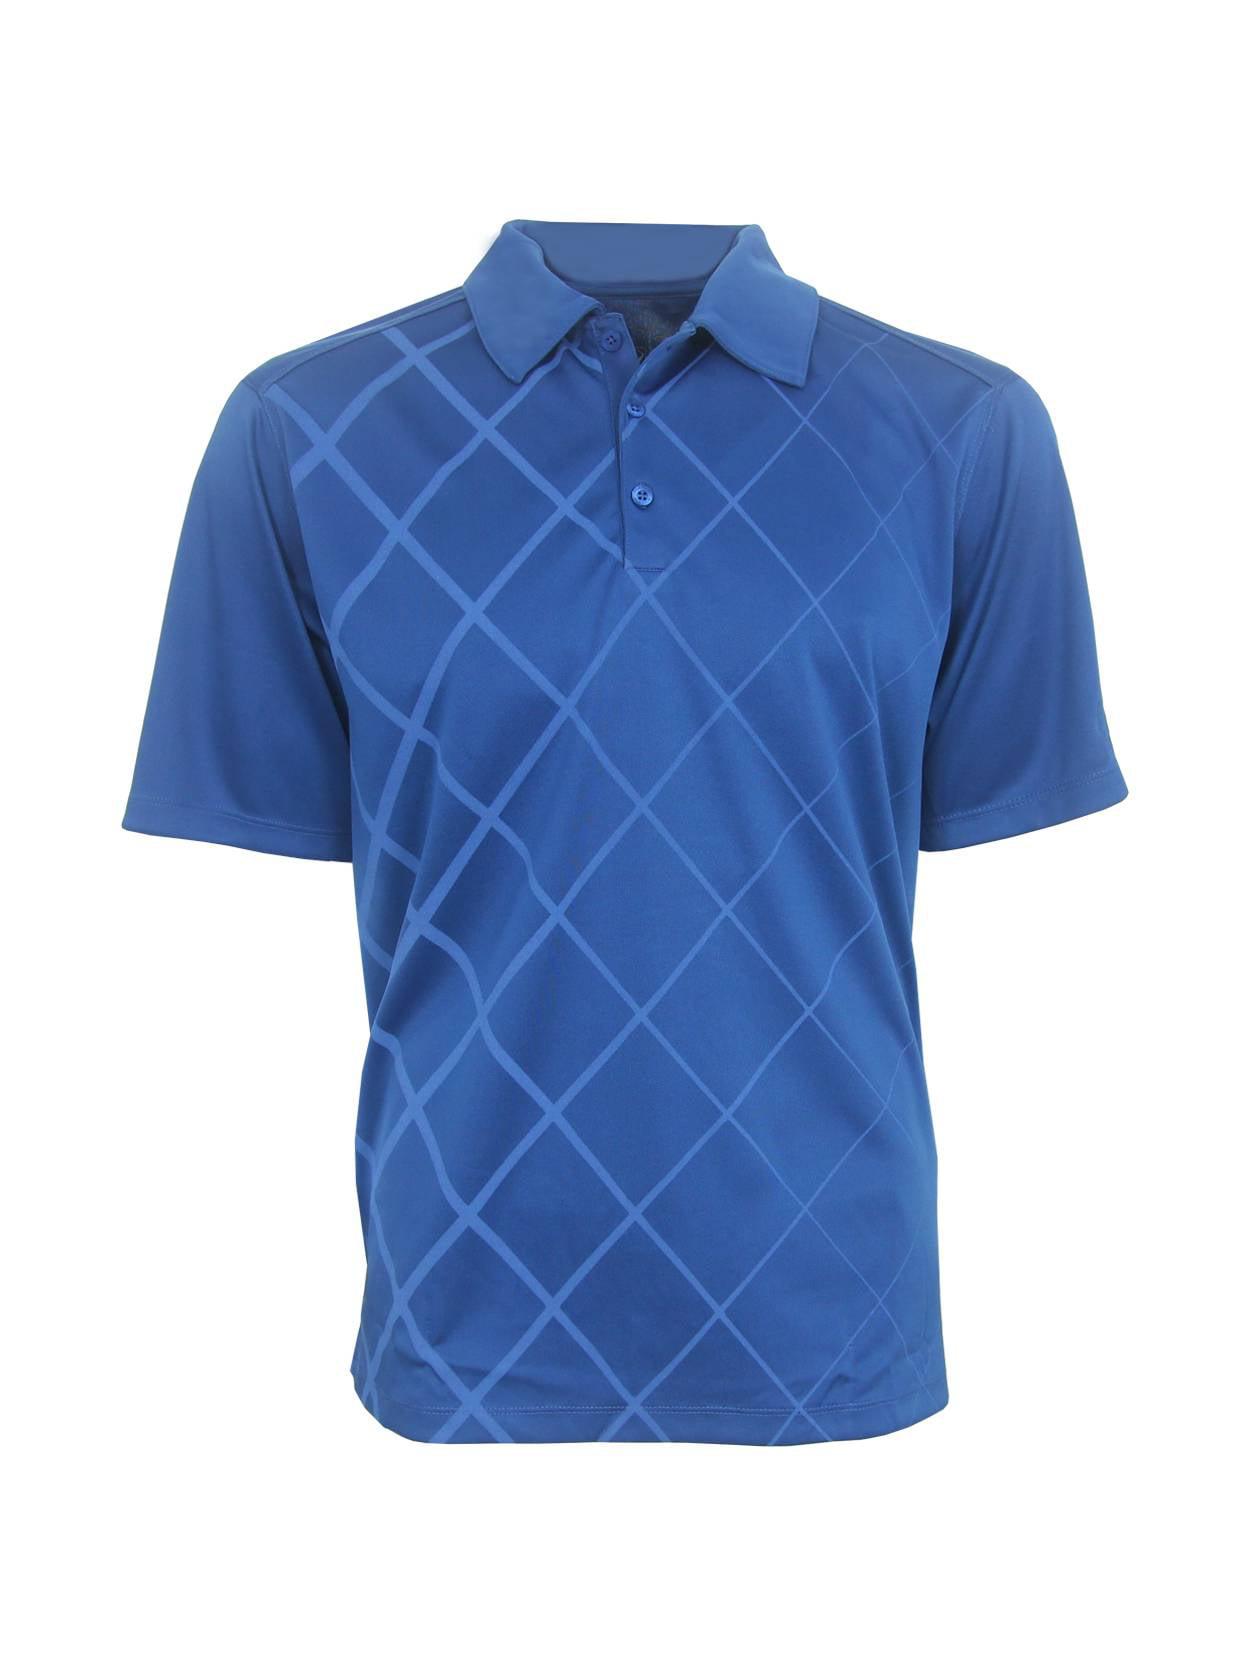 Pga Tour Mens Diamond Print Polo Golf Shirt Brand New Walmart